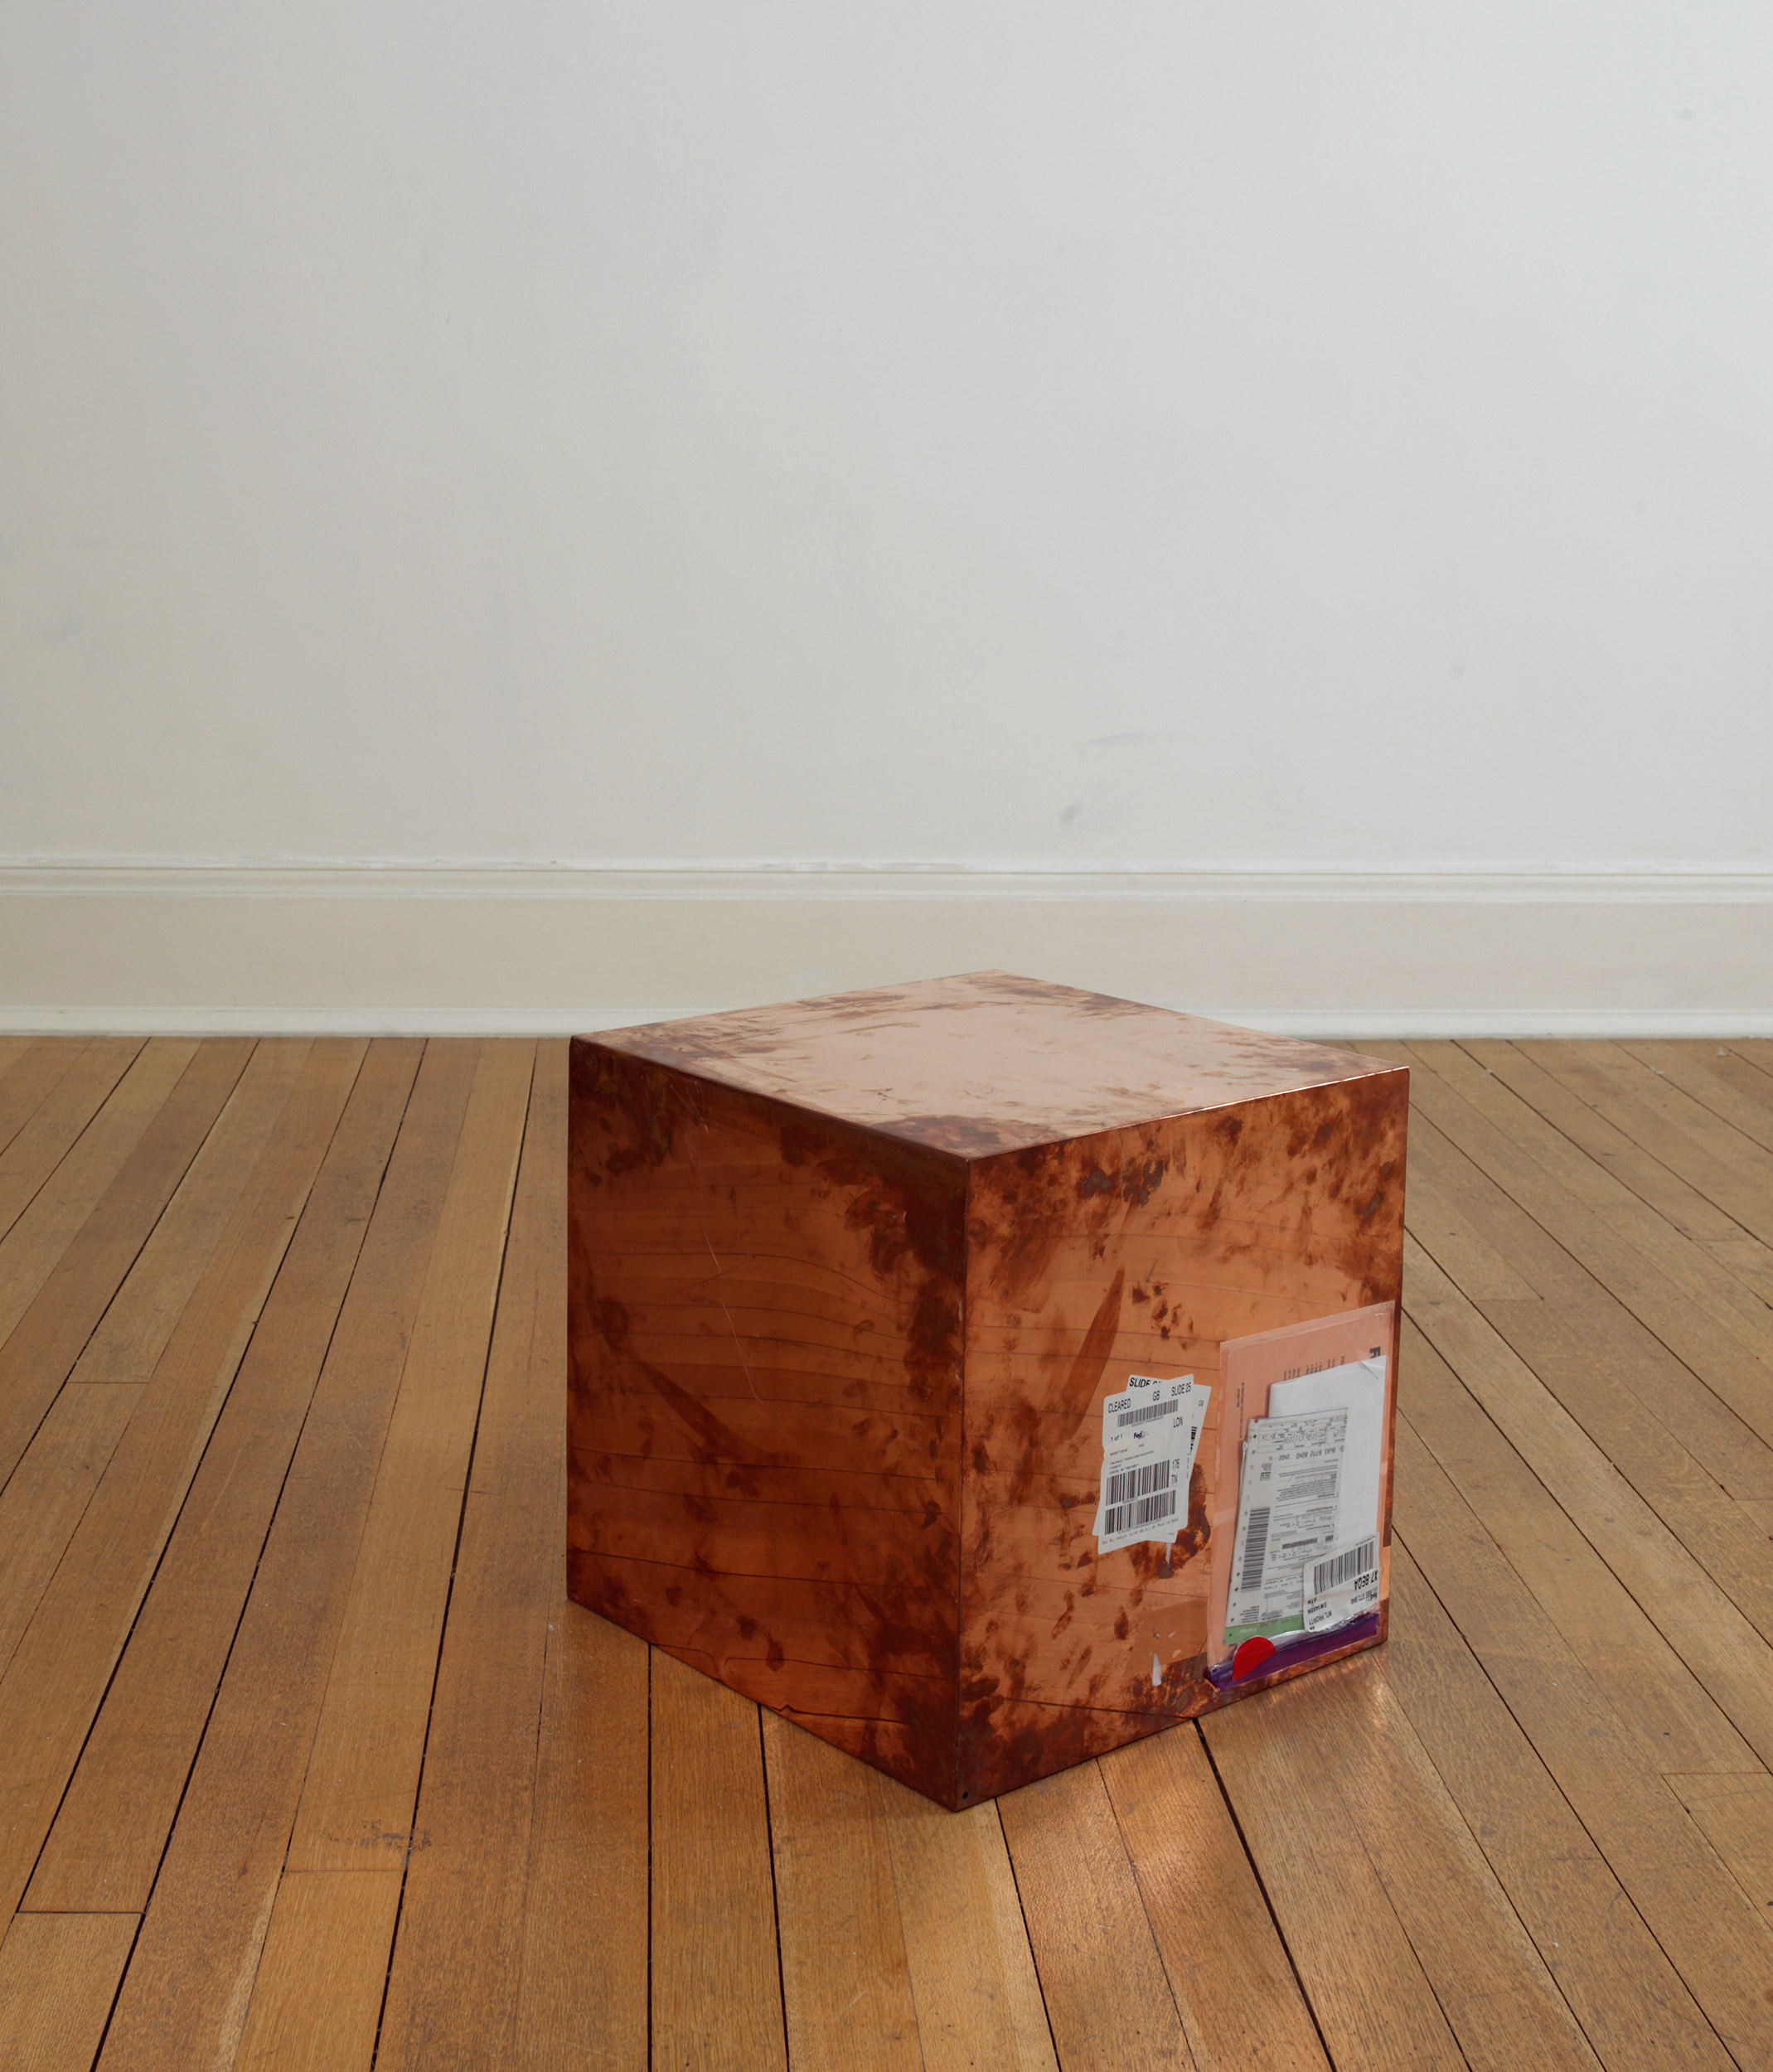 FedEx® Large Kraft Box  © 2005 FEDEX 330508 REV 10/05 SSCC, International Priority, Los Angeles–London trk#868587728040, October 02–05, 2009, International Priority, London–New York trk#863822956489, November 18–20, 2009, International Priority, New York–London trk#795200981790, September 19–21, 2011   2009–  Polished copper, accrued FedEx shipping and tracking labels  20 x 20 x 20 inches   FedEx Copper Works, 2009–    Production Stills, 2009